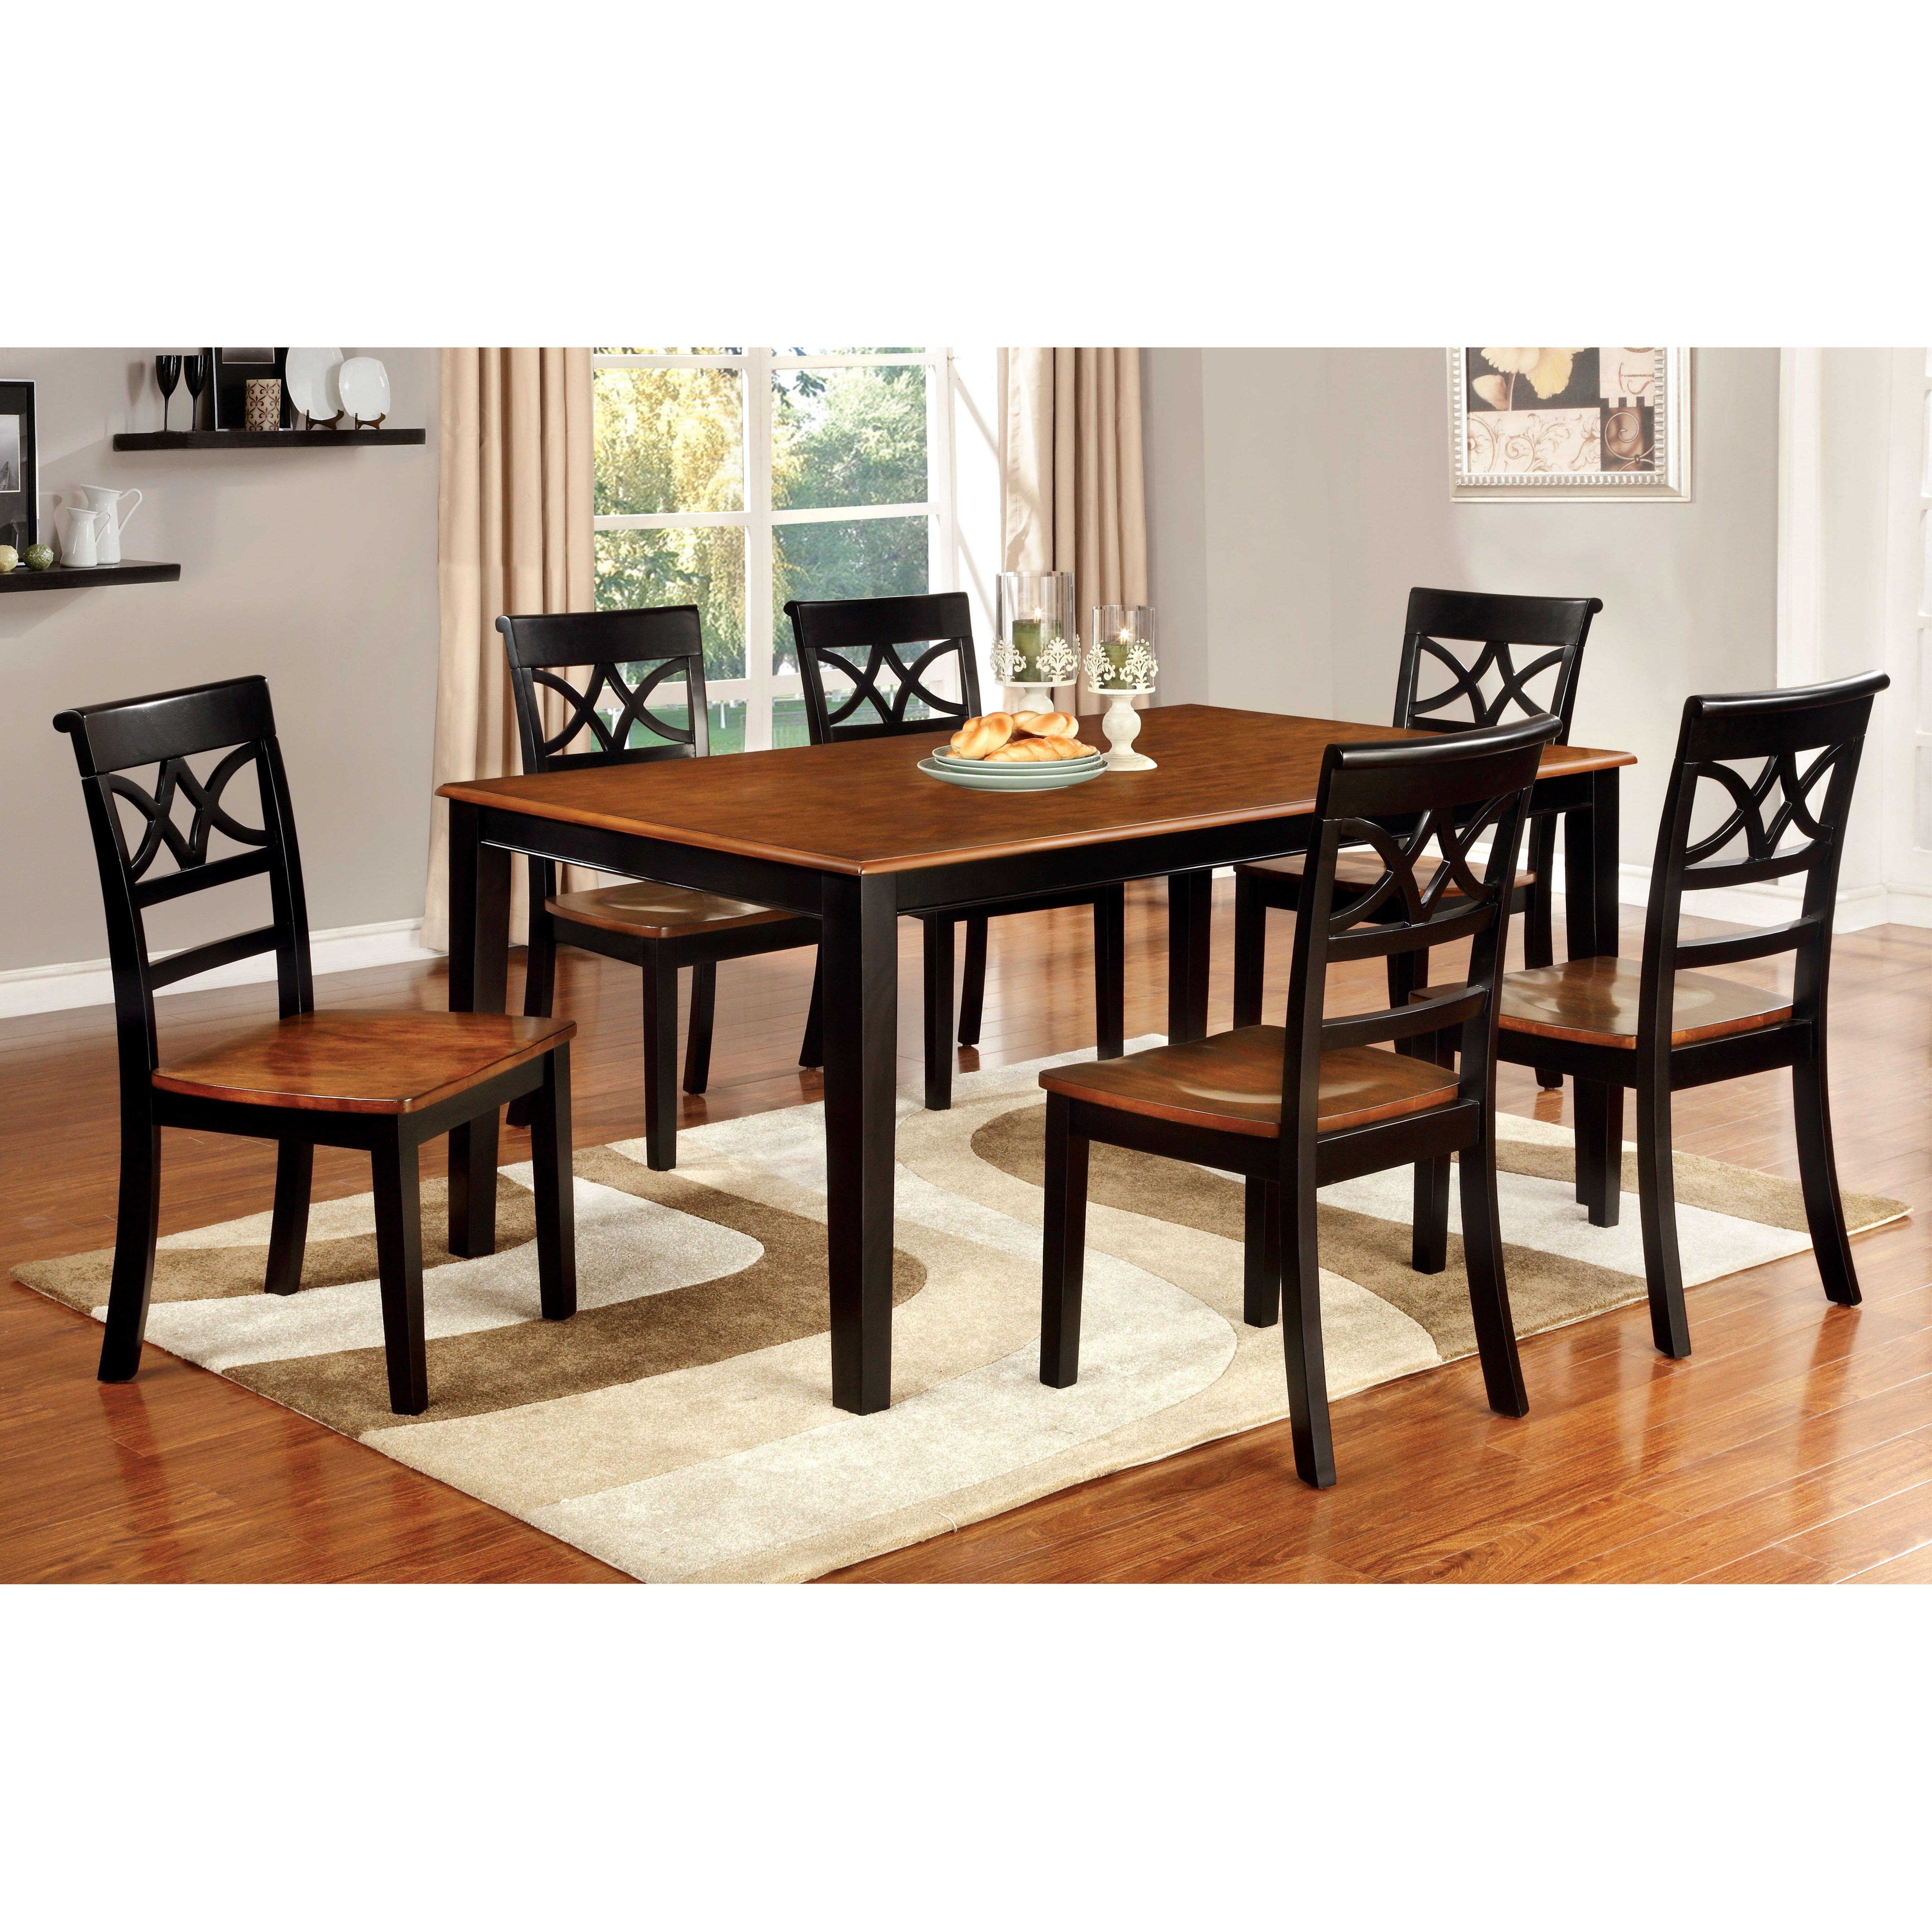 Hokku designs exenia 7 piece dining set reviews wayfair Dining set design ideas